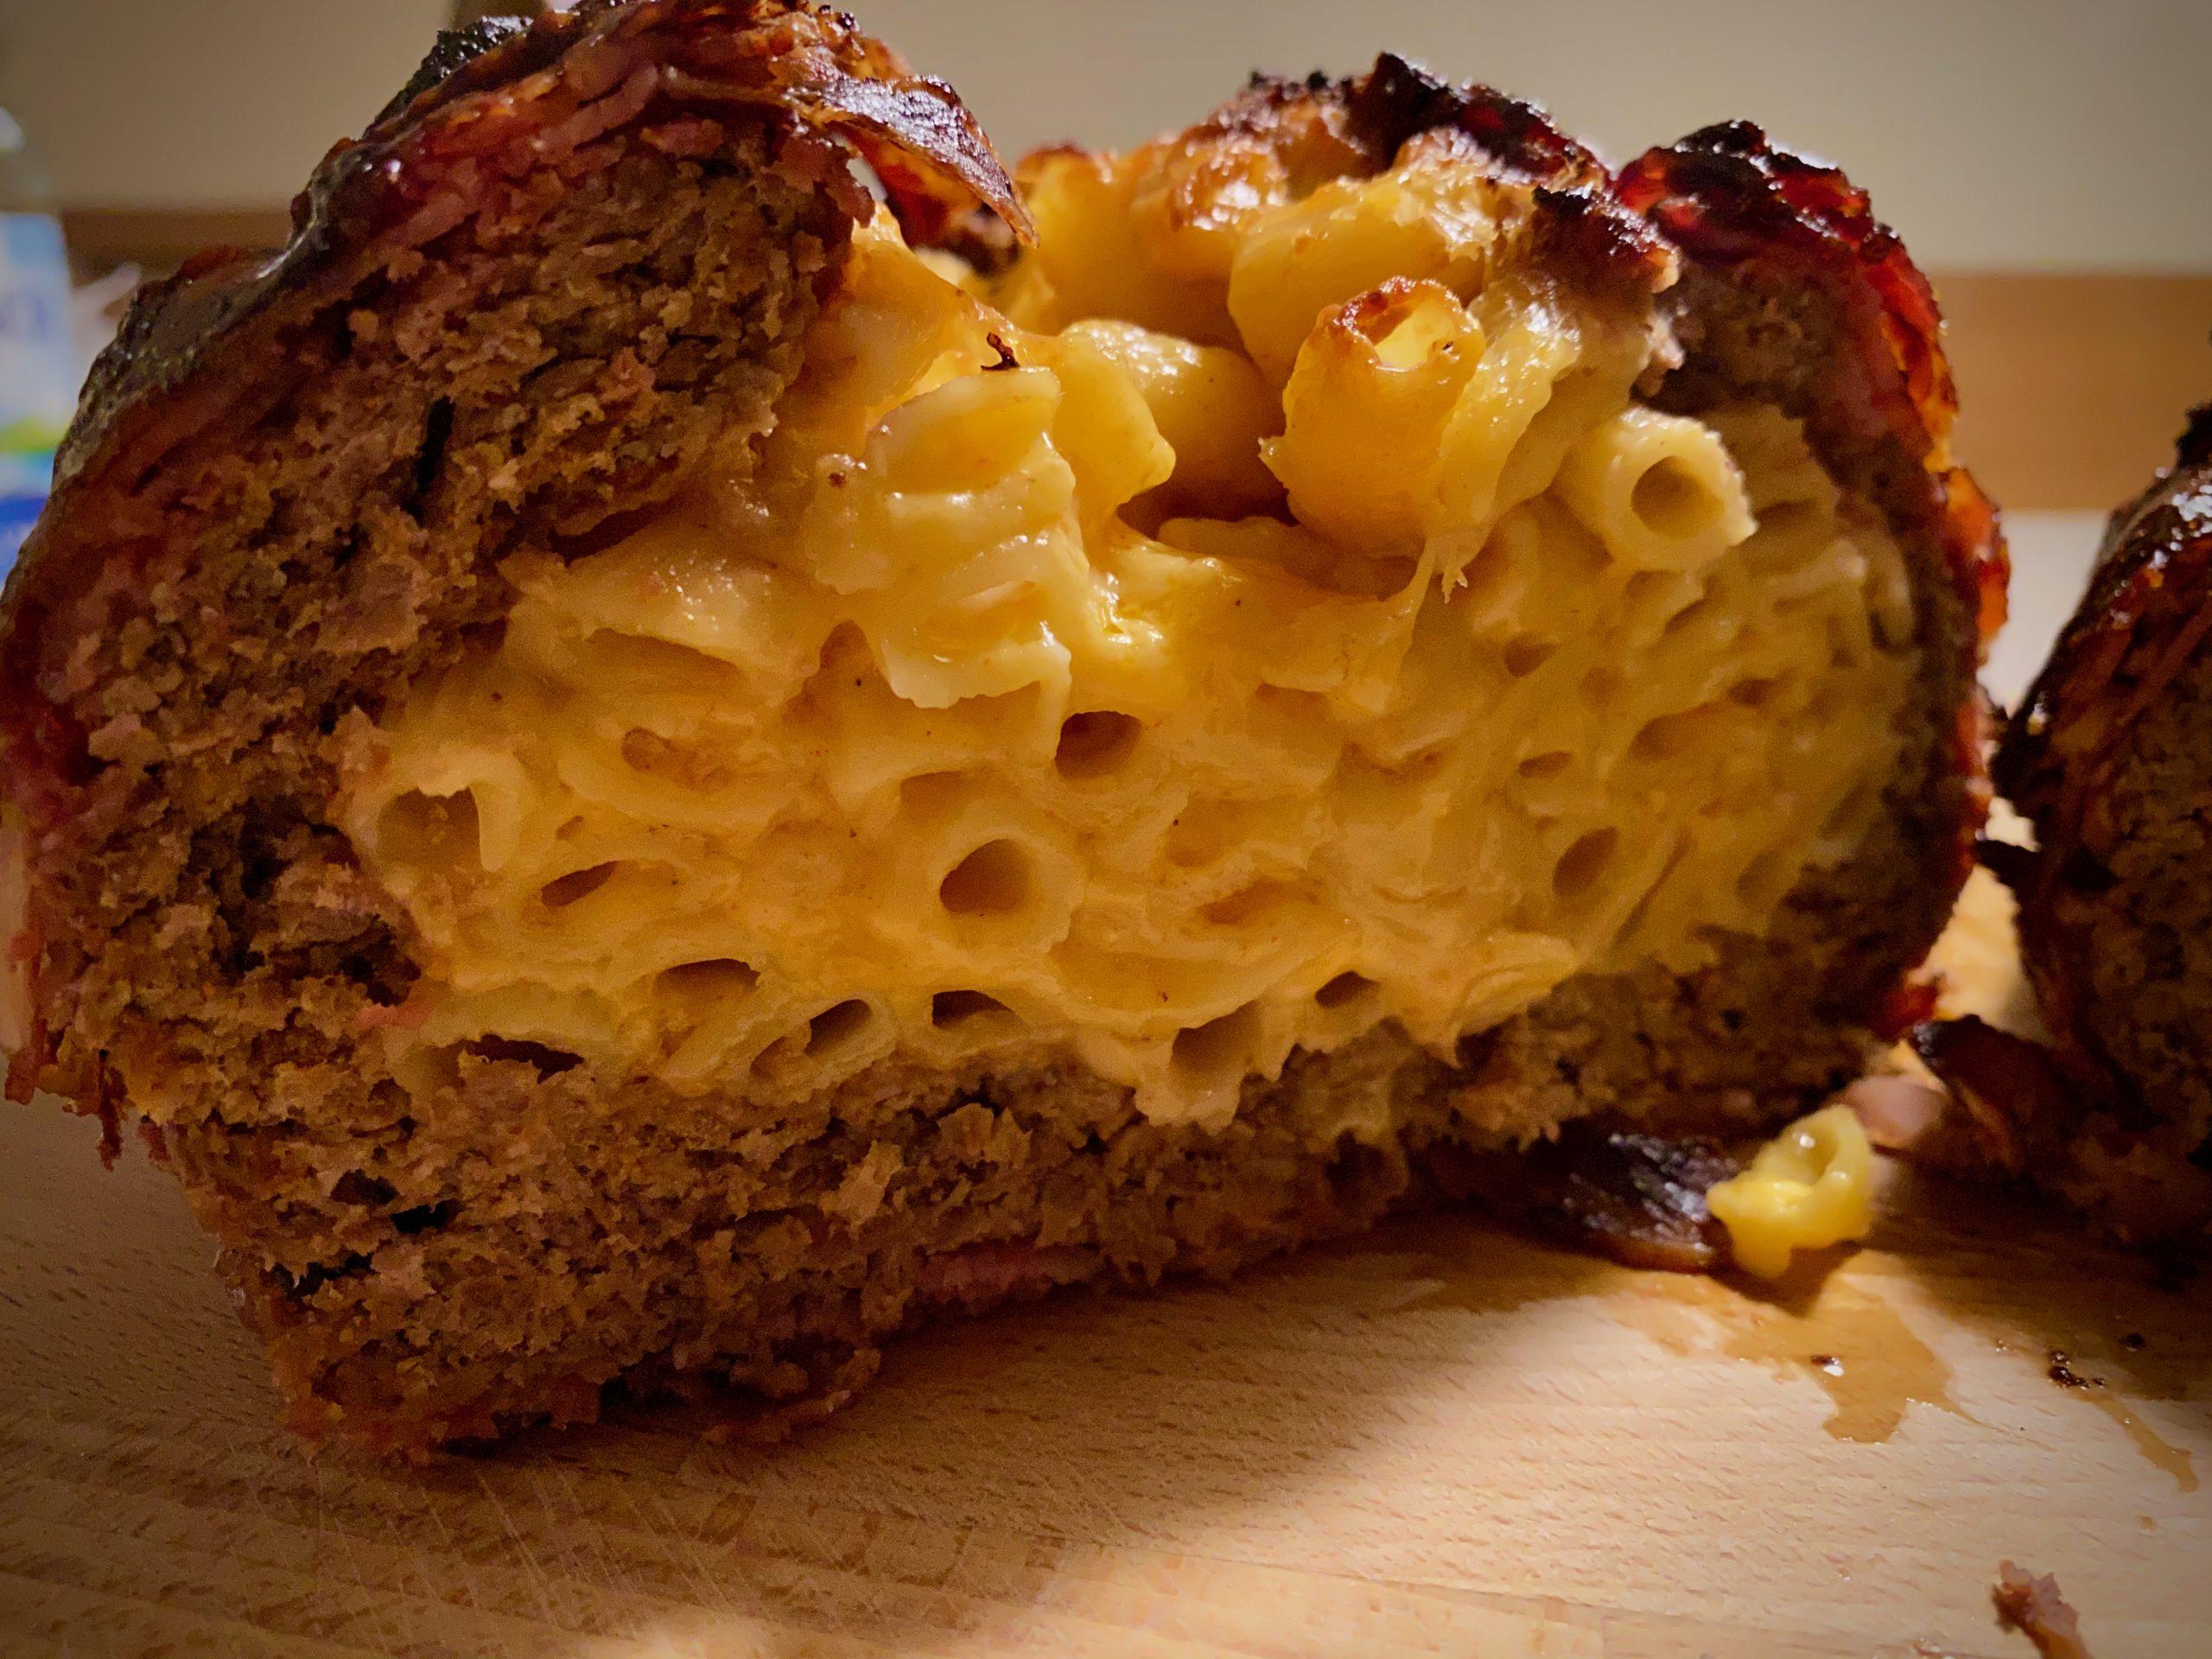 Bacon Bomb mit Mac'n'Cheese Füllung – Die ultimative Kombination